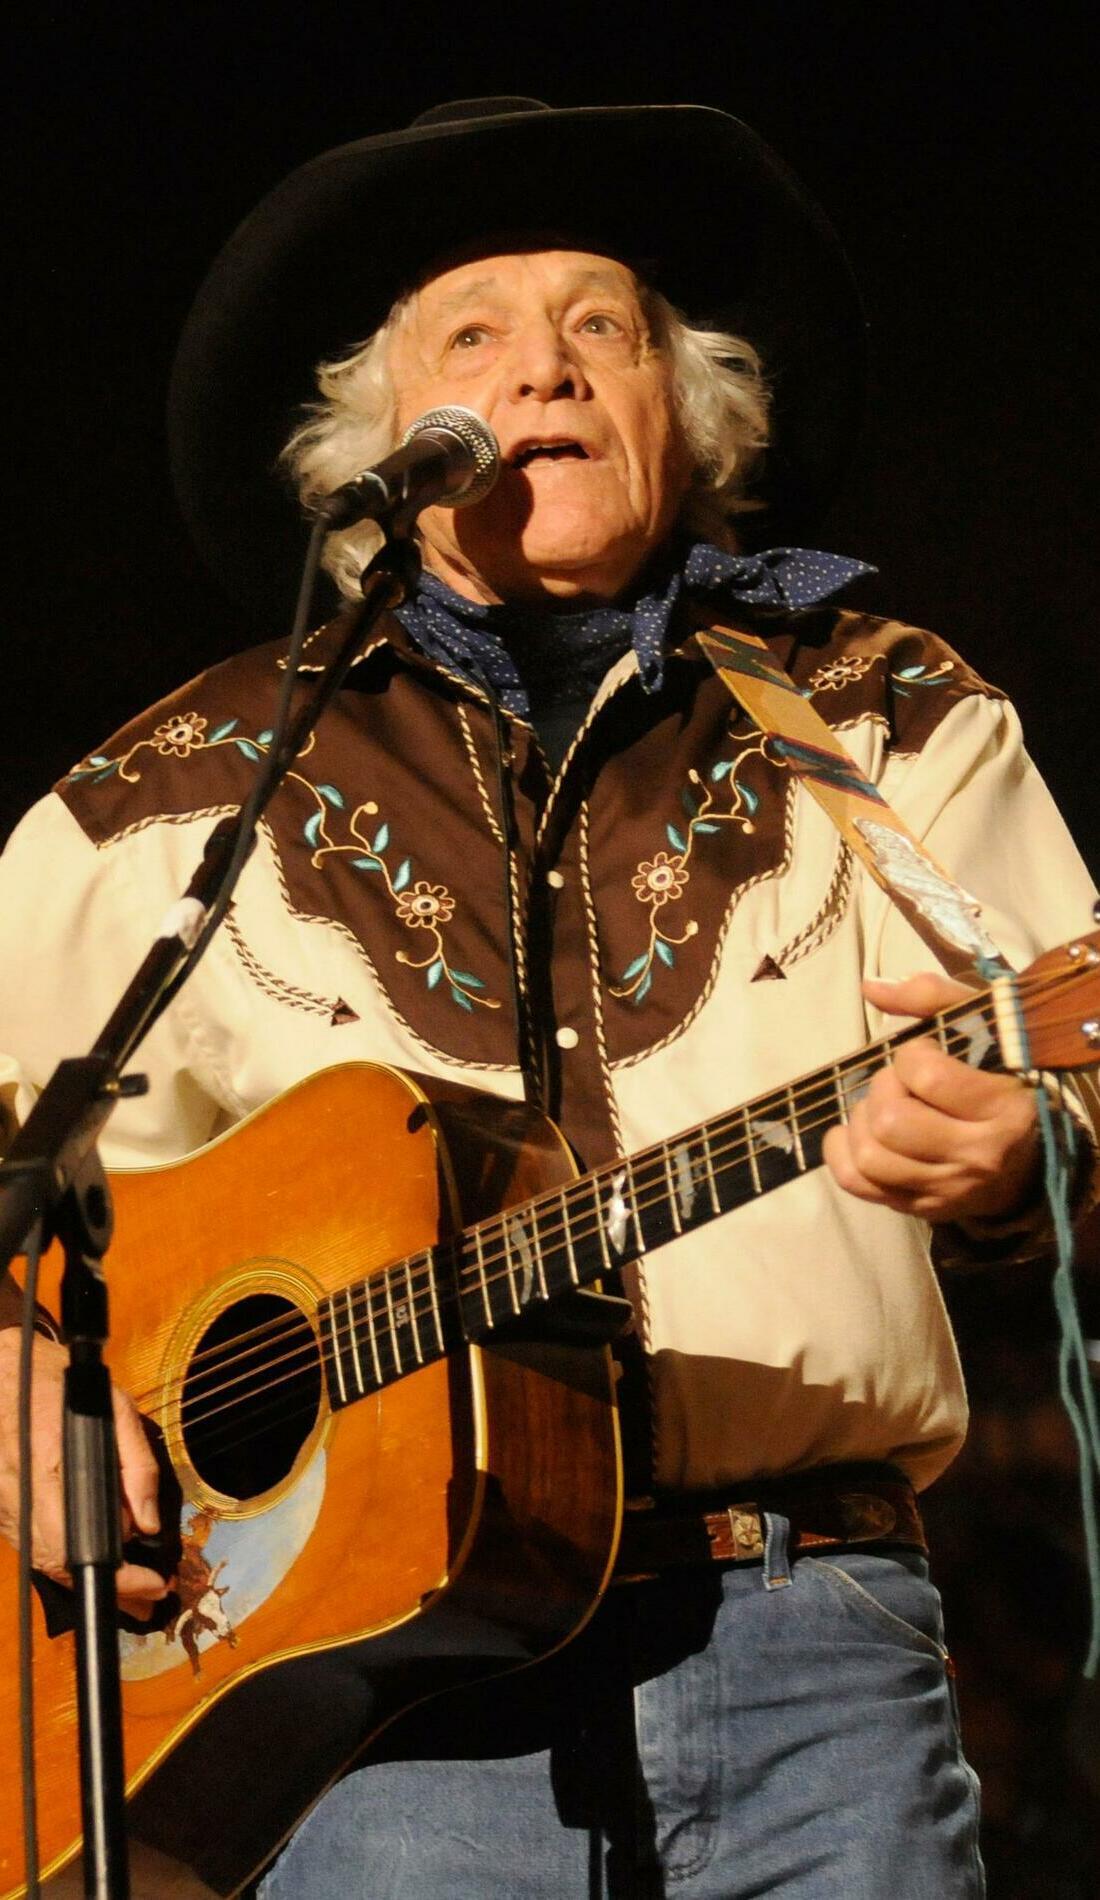 A Ramblin' Jack Elliott live event